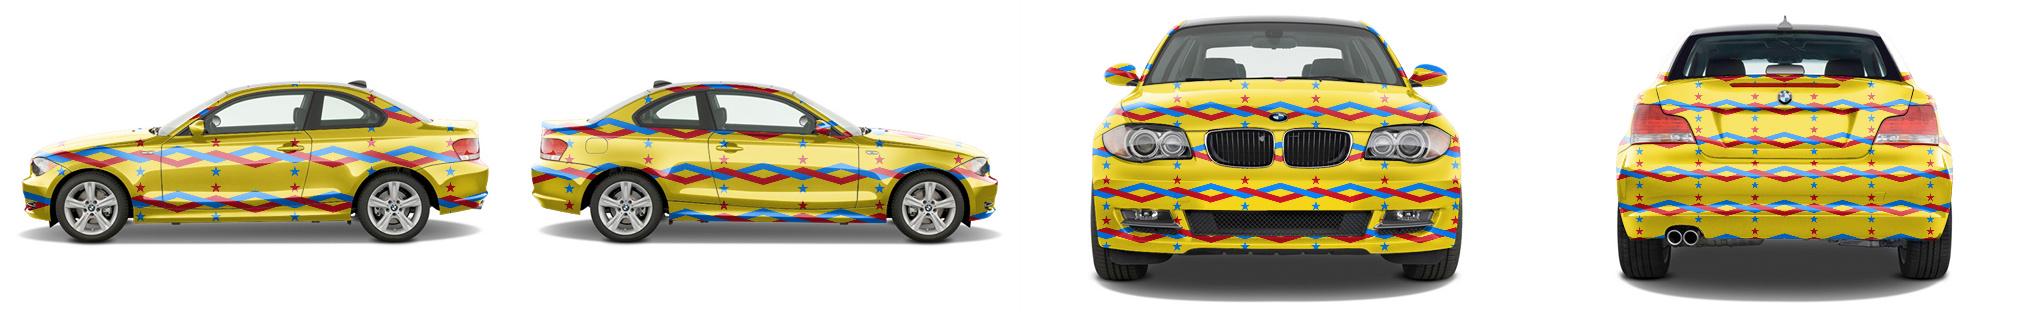 Sports Coupe Wrap #53210